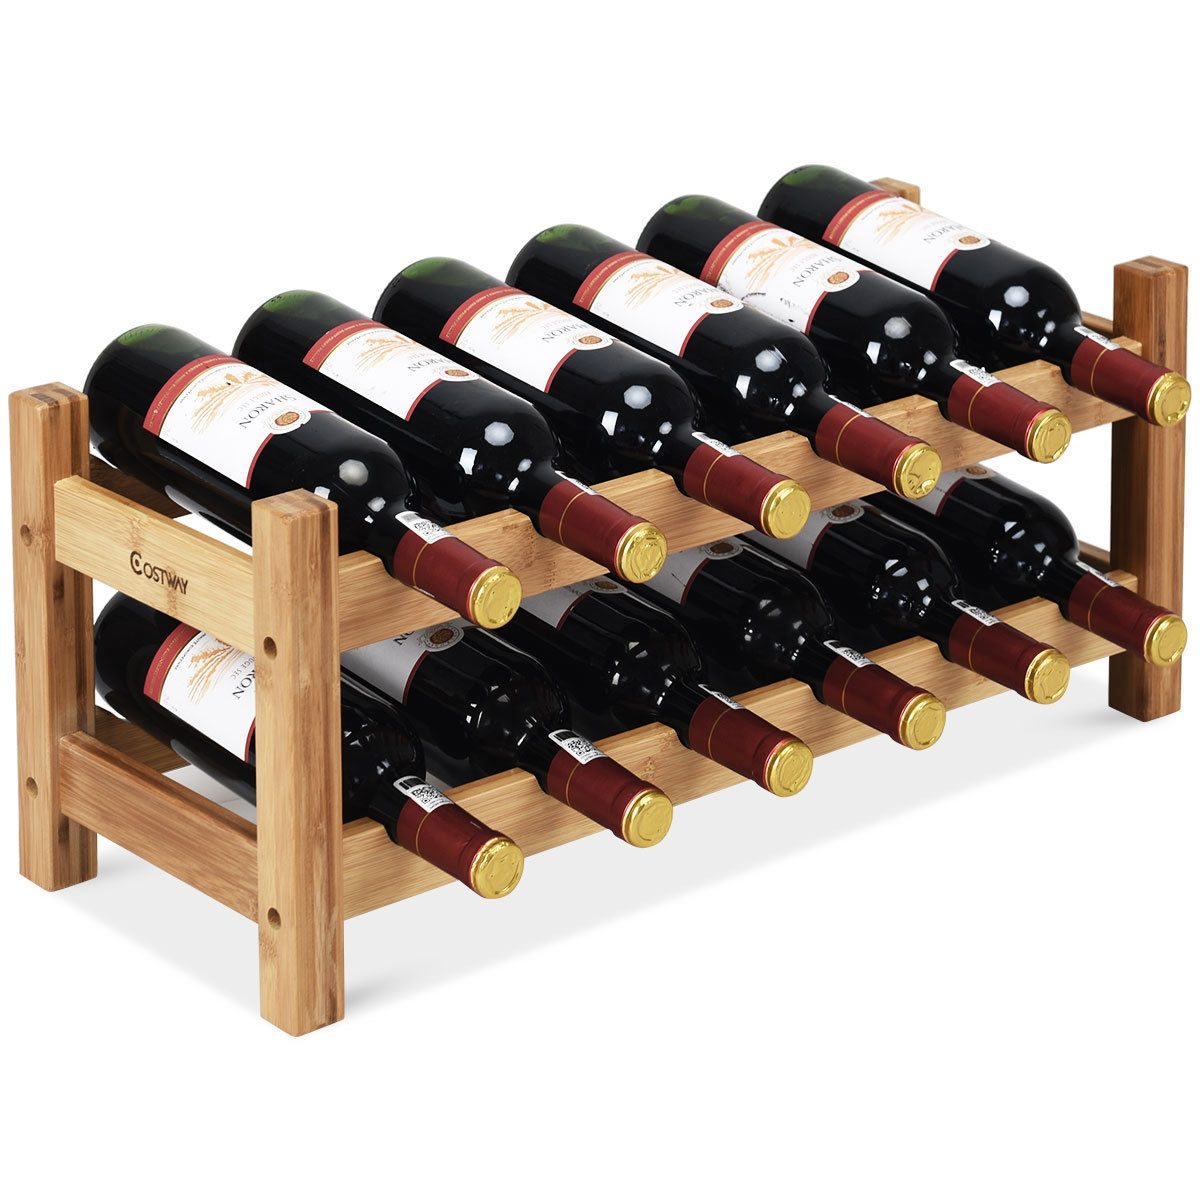 2-Tier 12 Bottles Bamboo Storage Shelf  Wine Rack